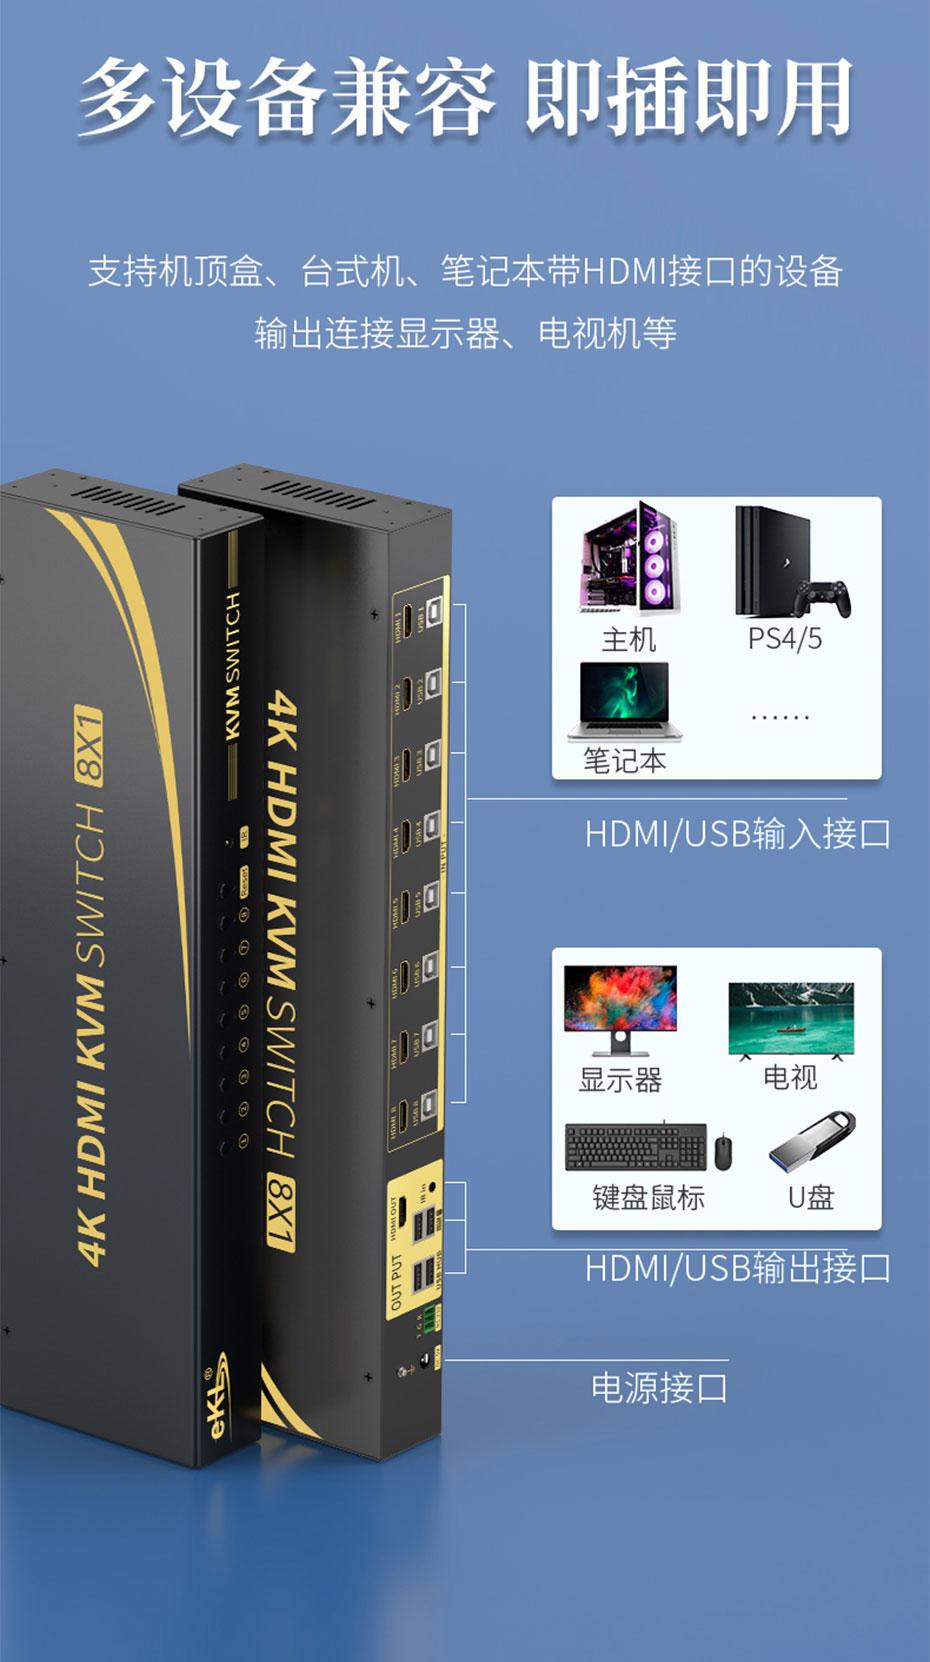 HDMI KVM切换器8进1出81HK兼容多种HDMI接口设备